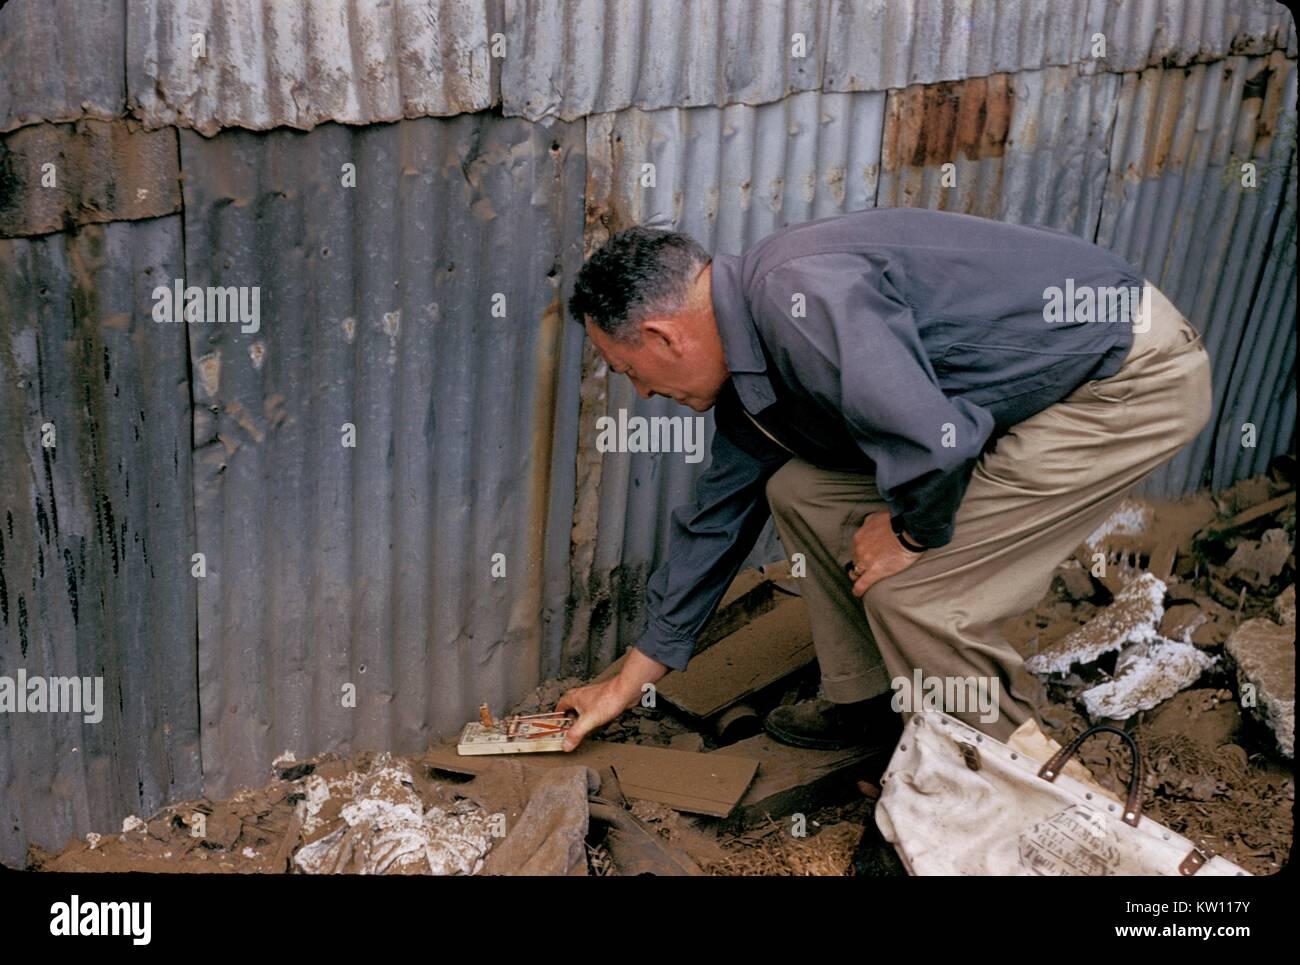 Old Vintage Rat Trap Stock Photos & Old Vintage Rat Trap Stock ...